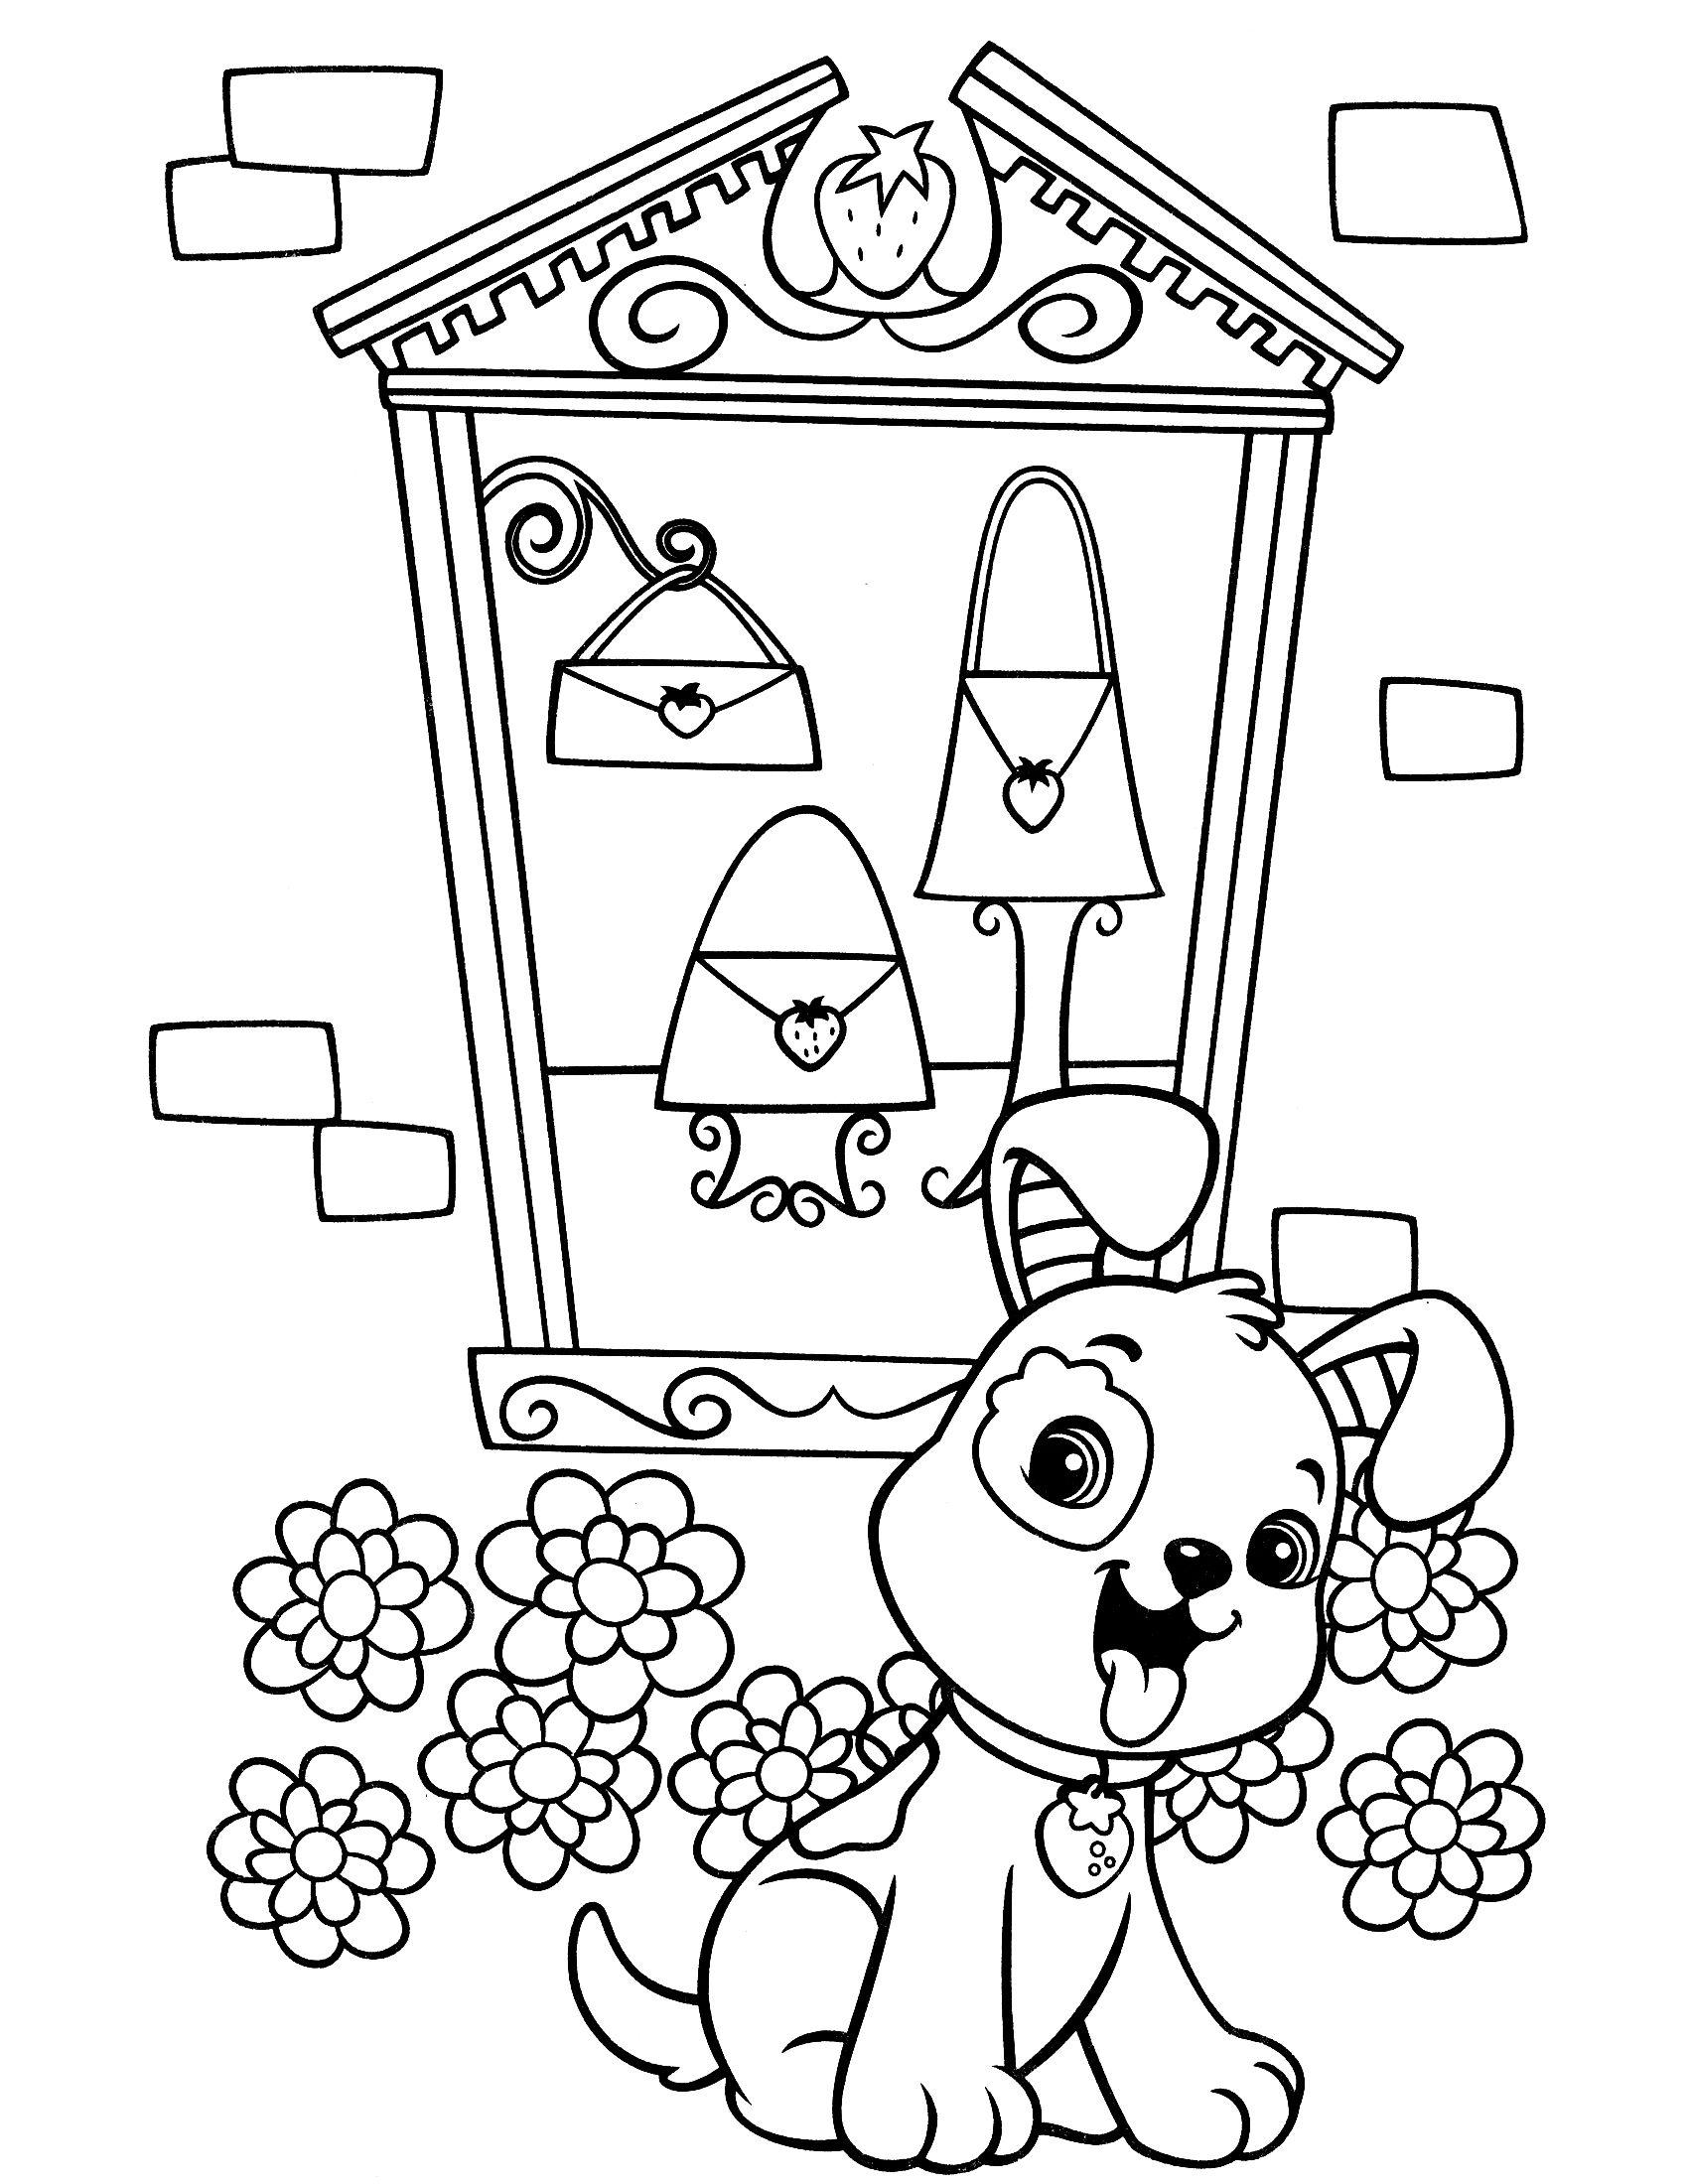 Strawberry Shortcake coloring page.01 | Strawberry Shortcake ...